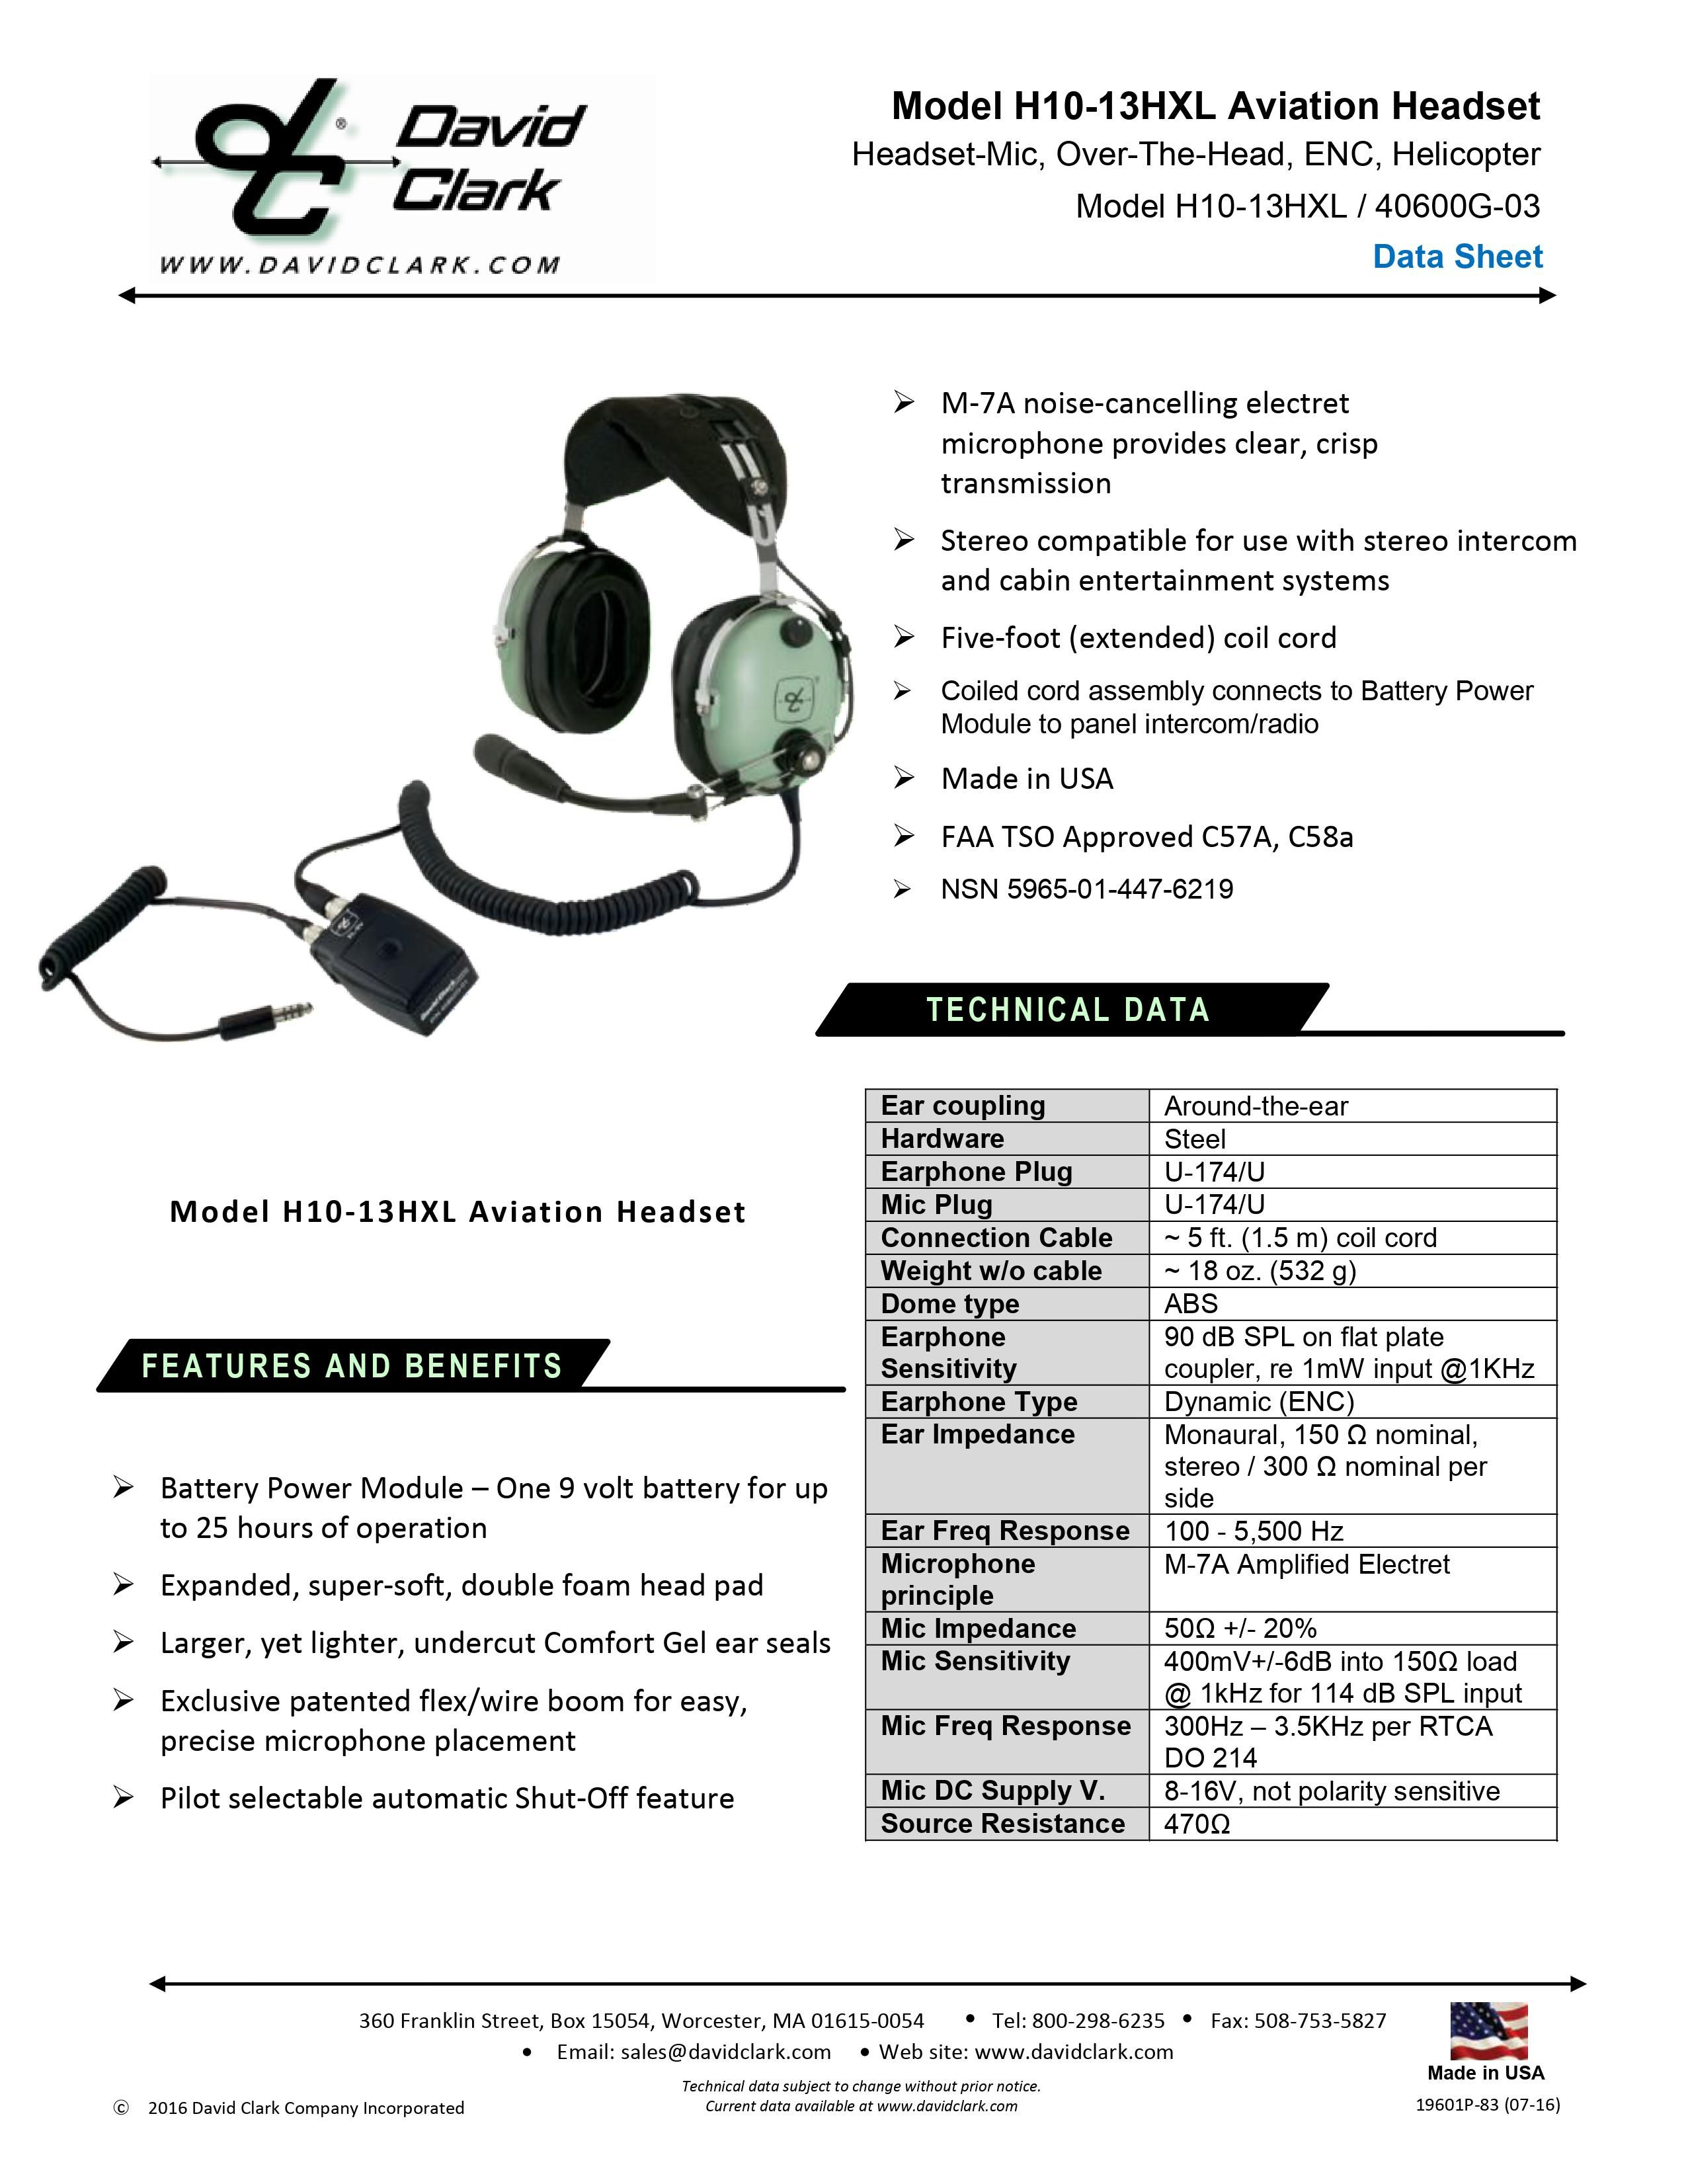 H10-13HXL TECHNICAL SPECS BUCKERBOOK